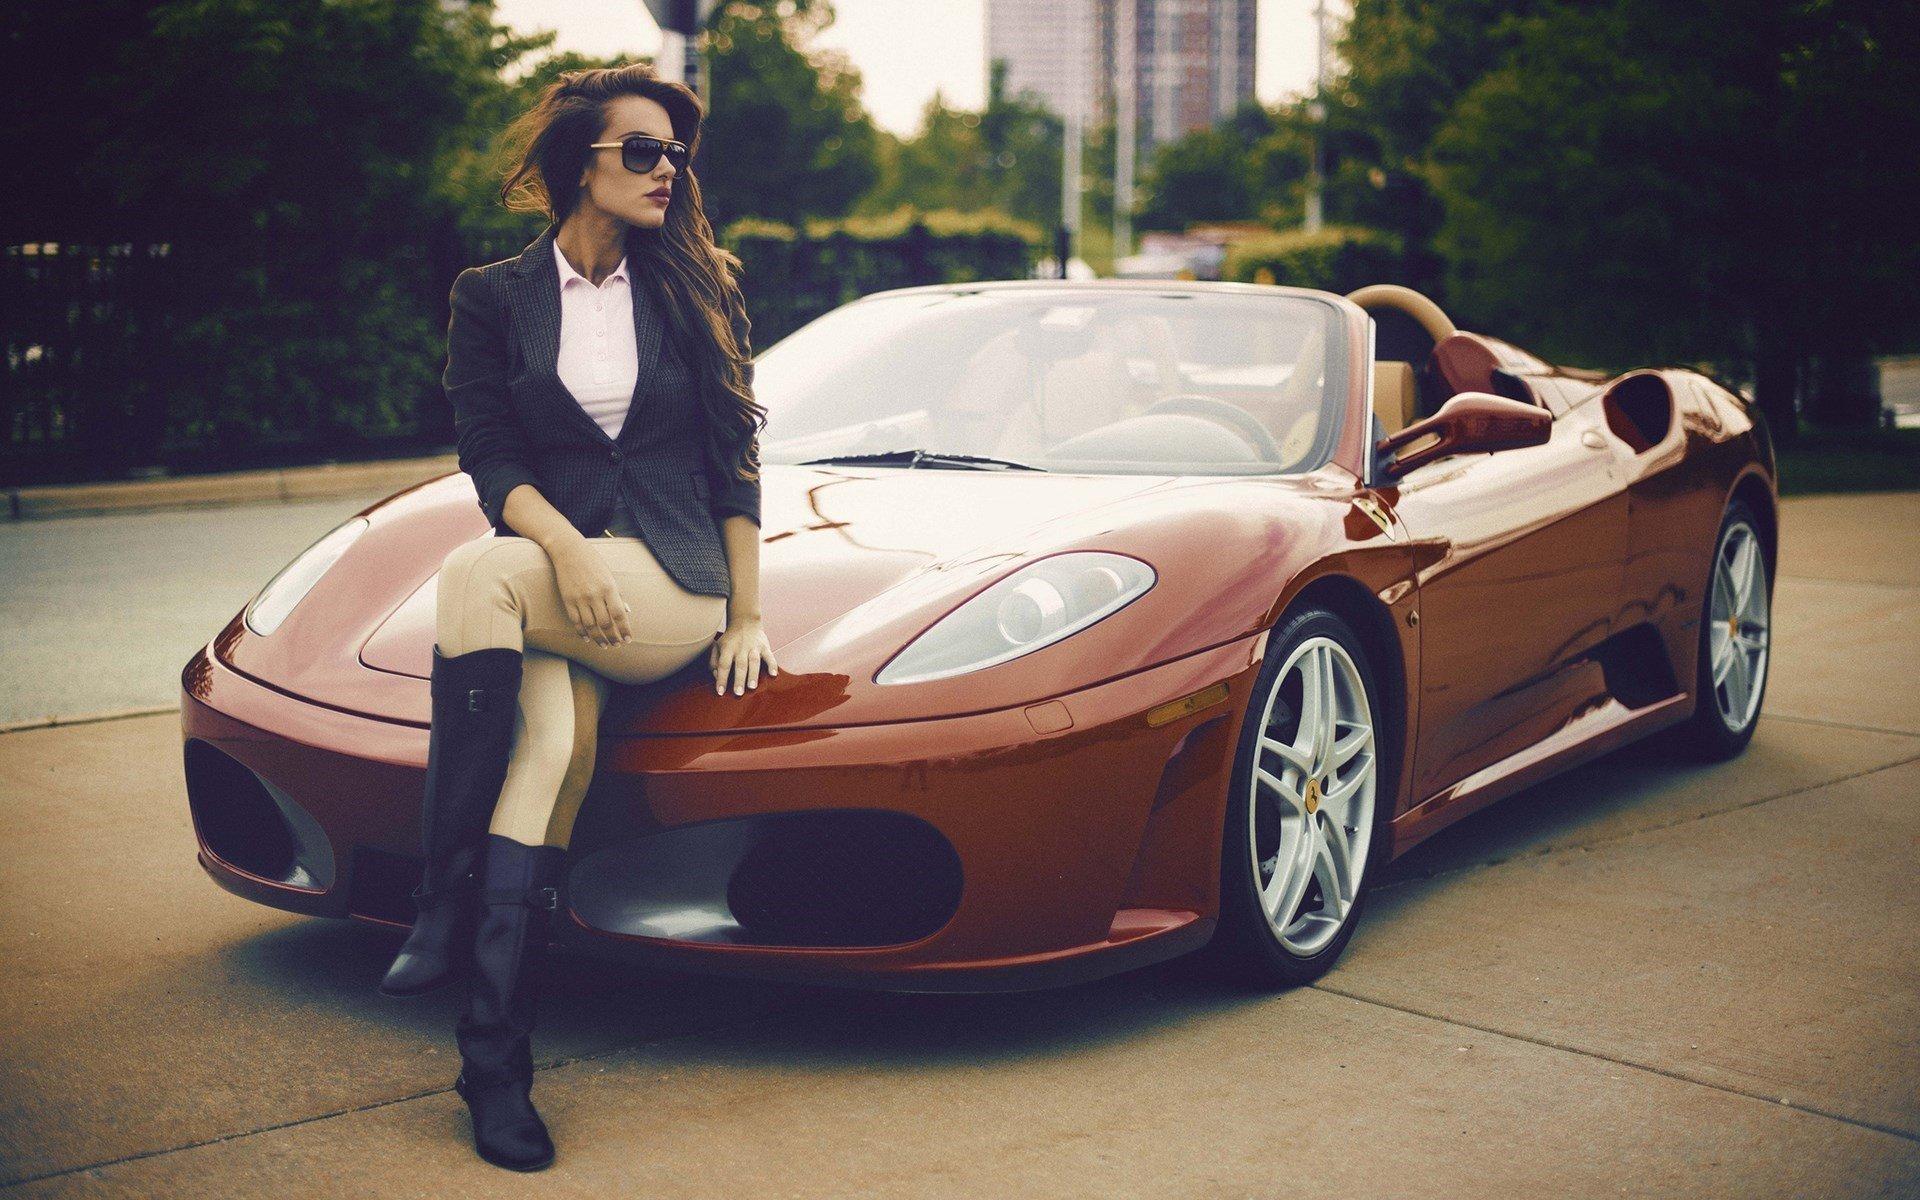 Car Ferrari Women Sunglasses Women With Cars Legs